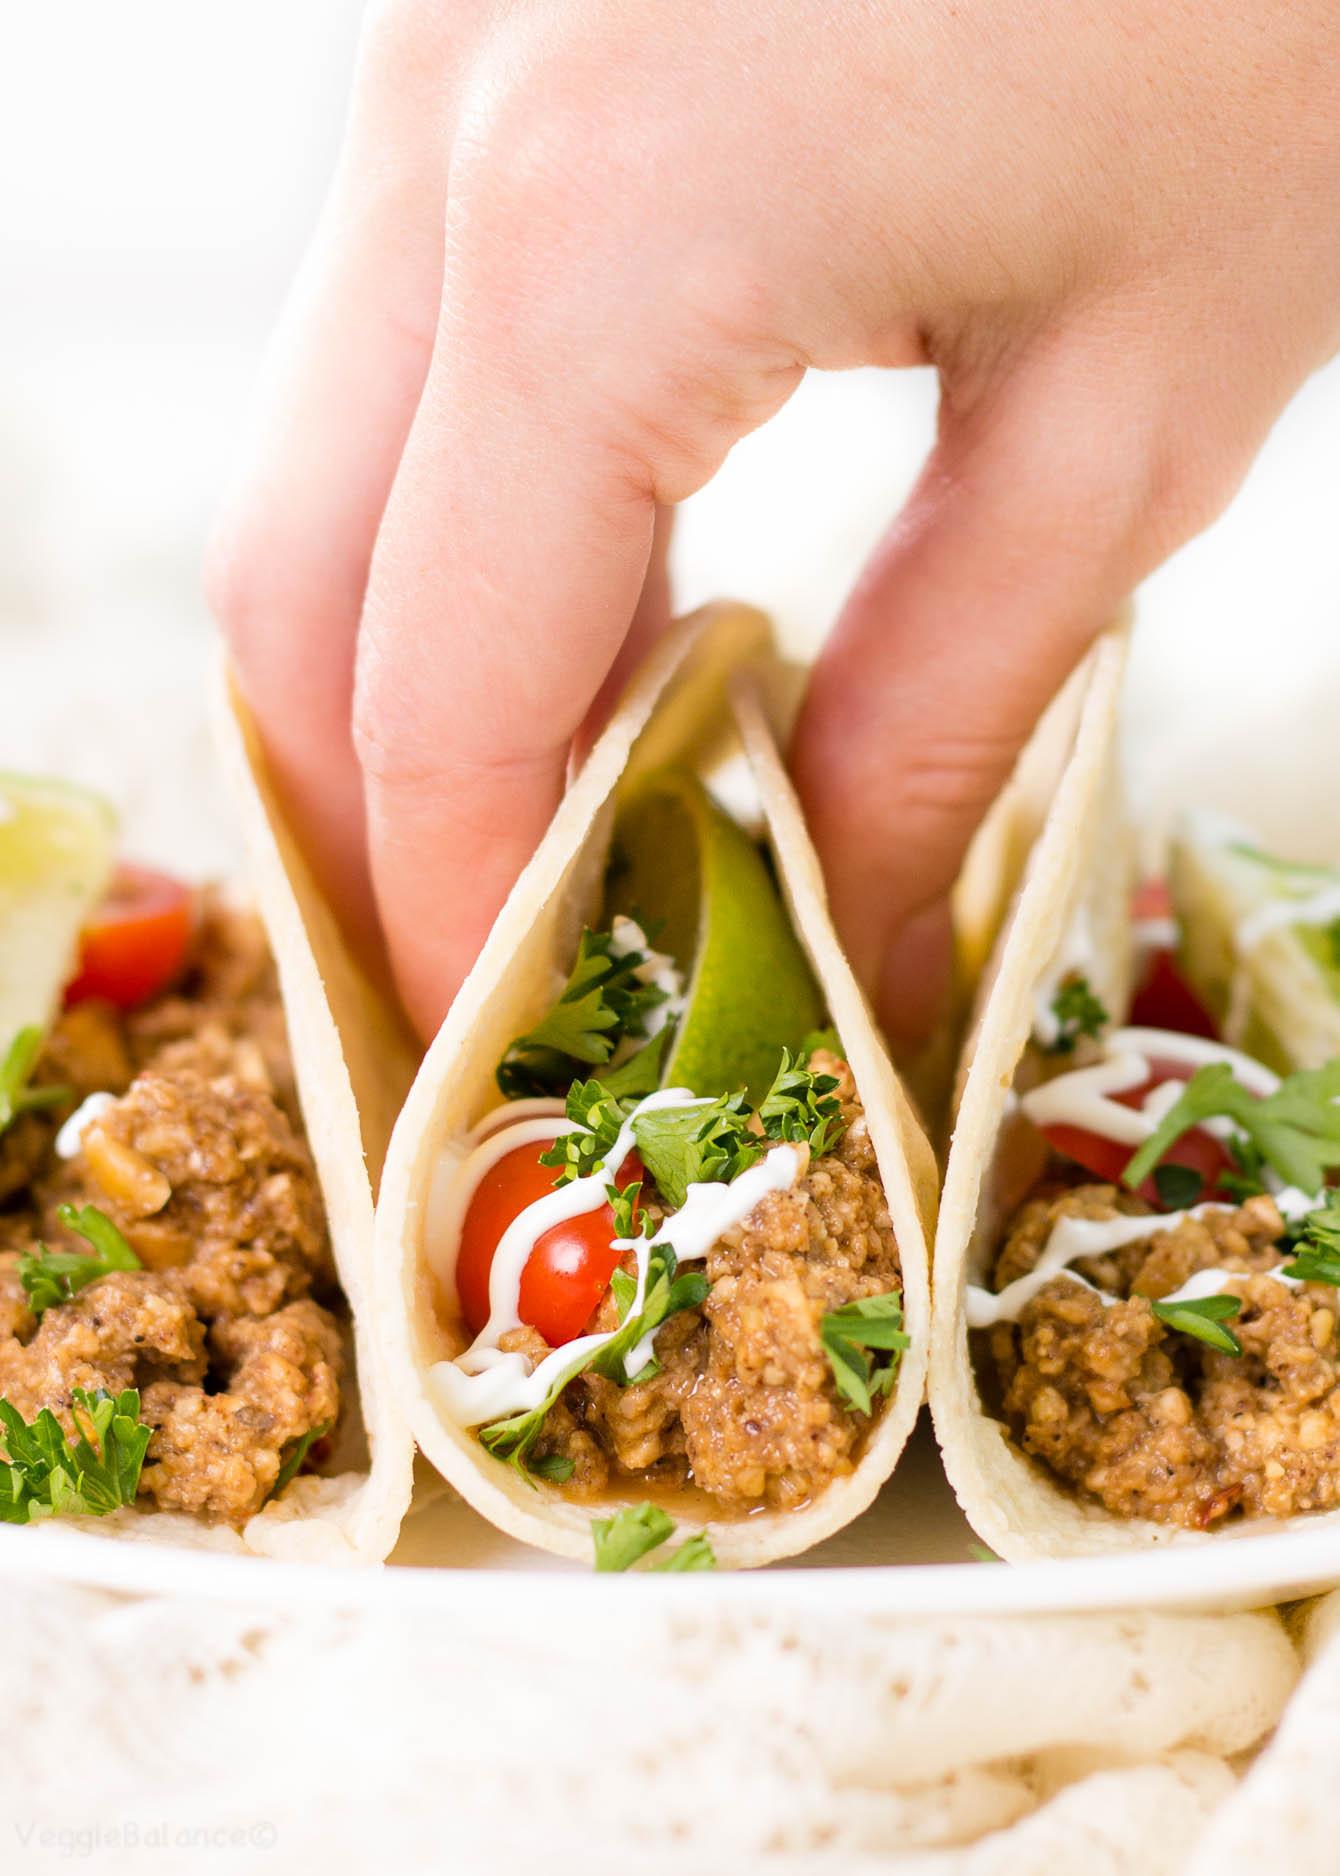 Gluten Free Vegetarian Recipes  Ve arian Taco Meat thats Gluten Free Gluten Free